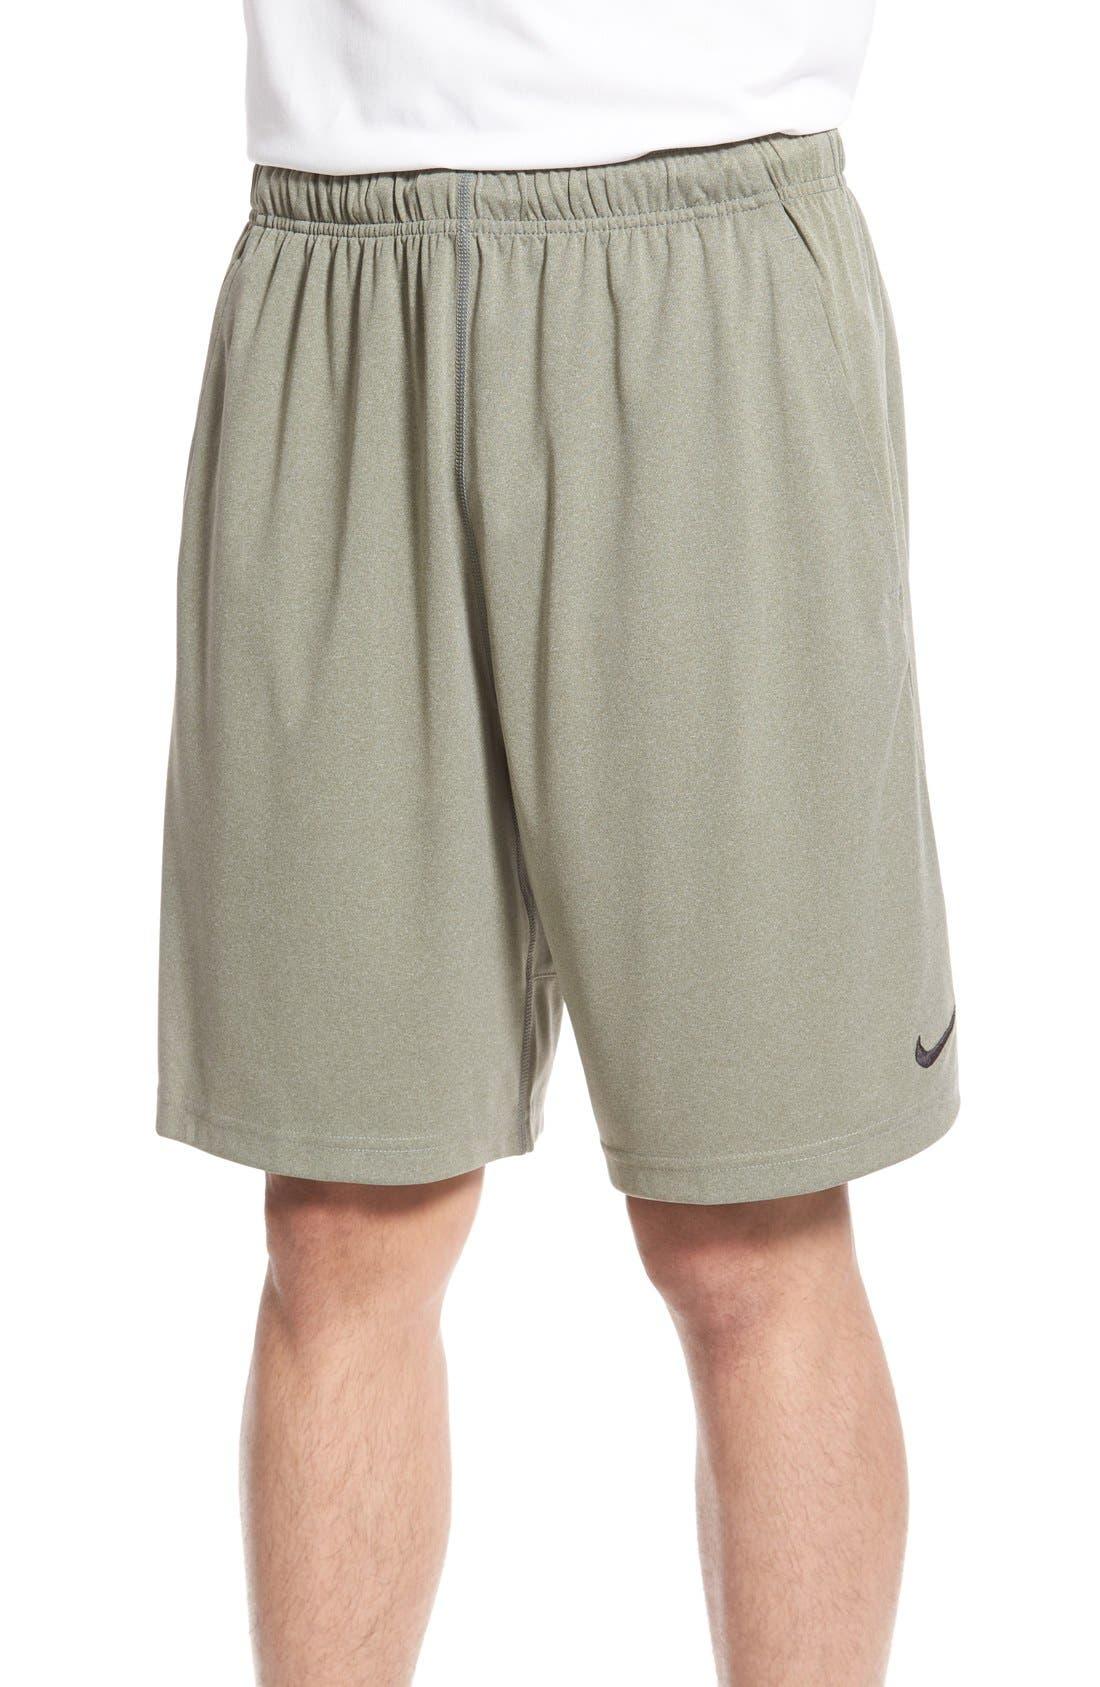 Main Image - Nike 'Fly' Dri-FIT Training Shorts